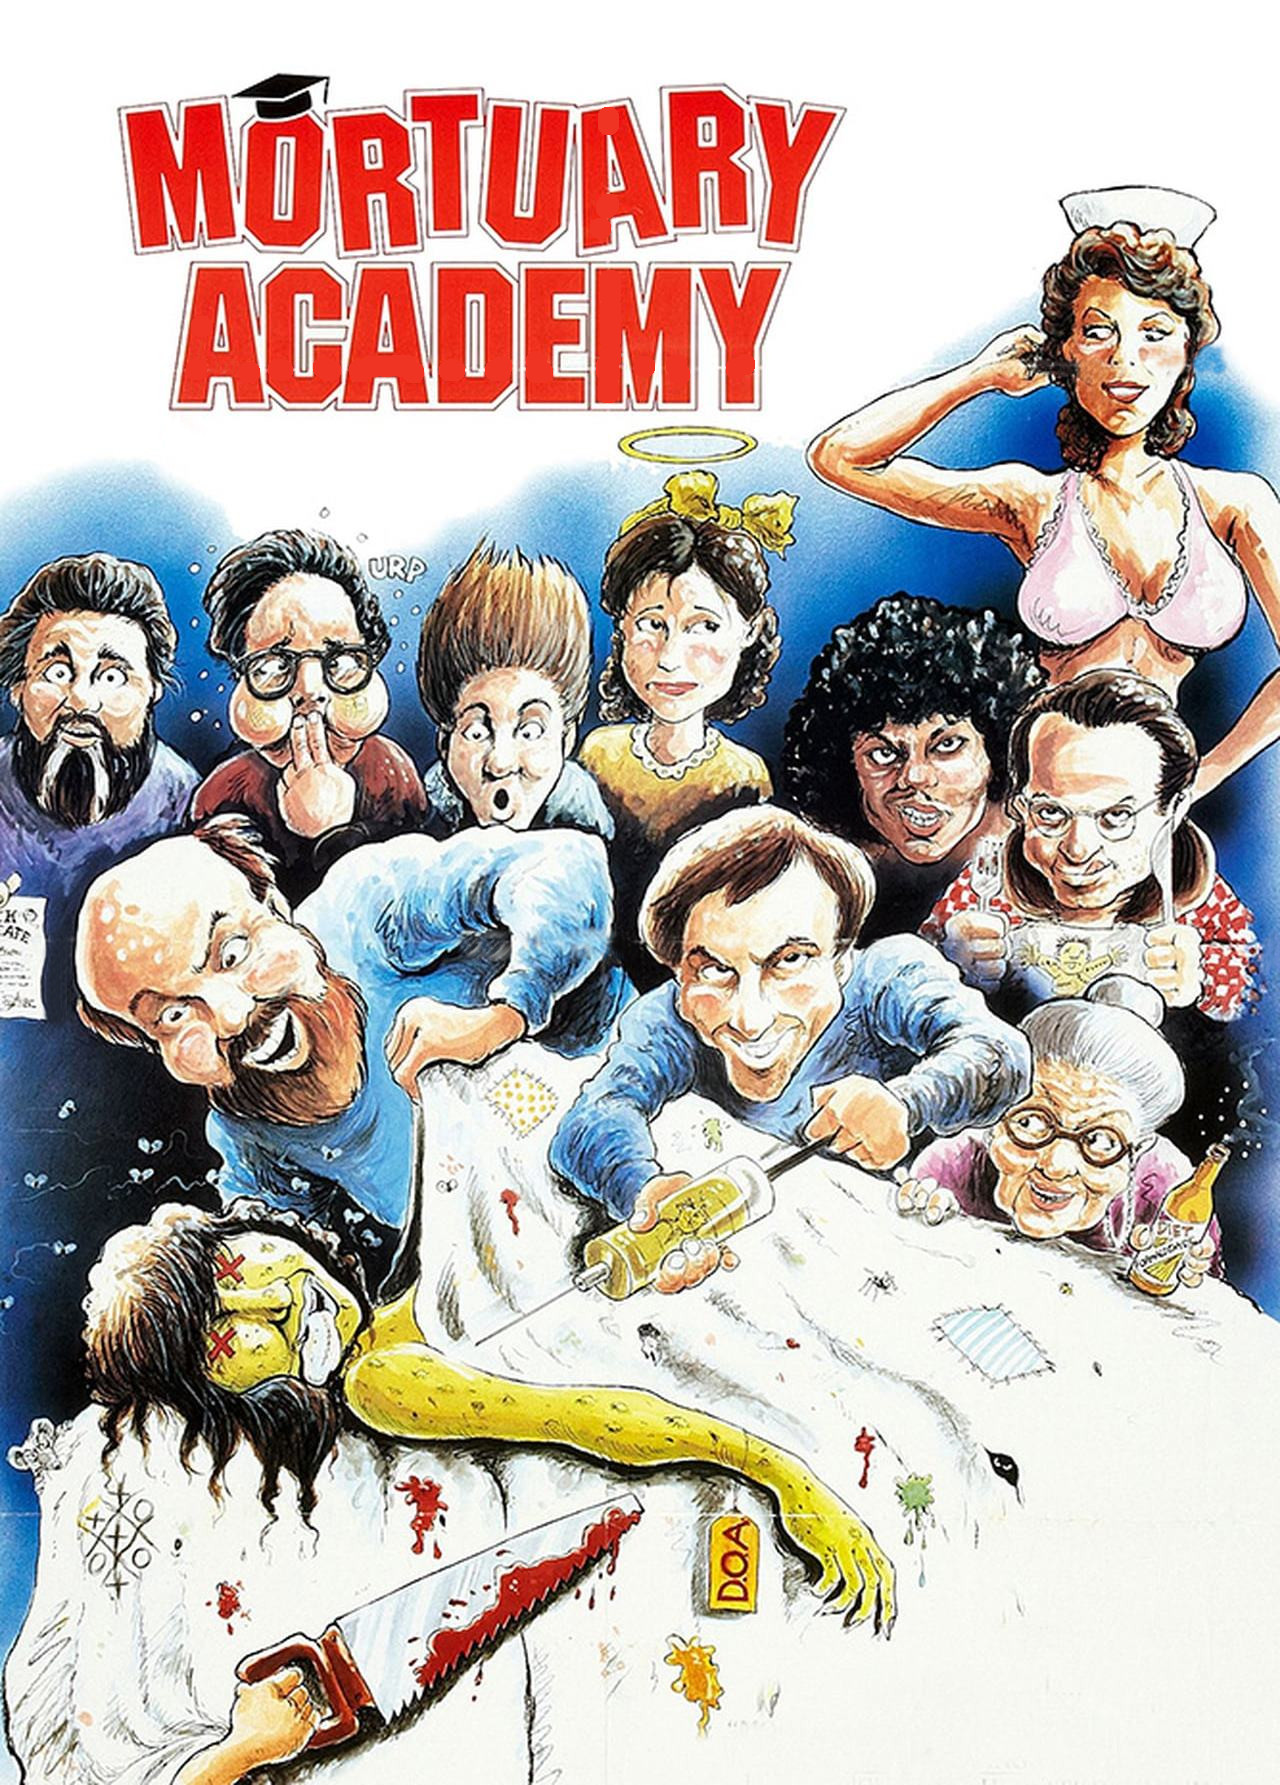 Mortuary Academy (1988)